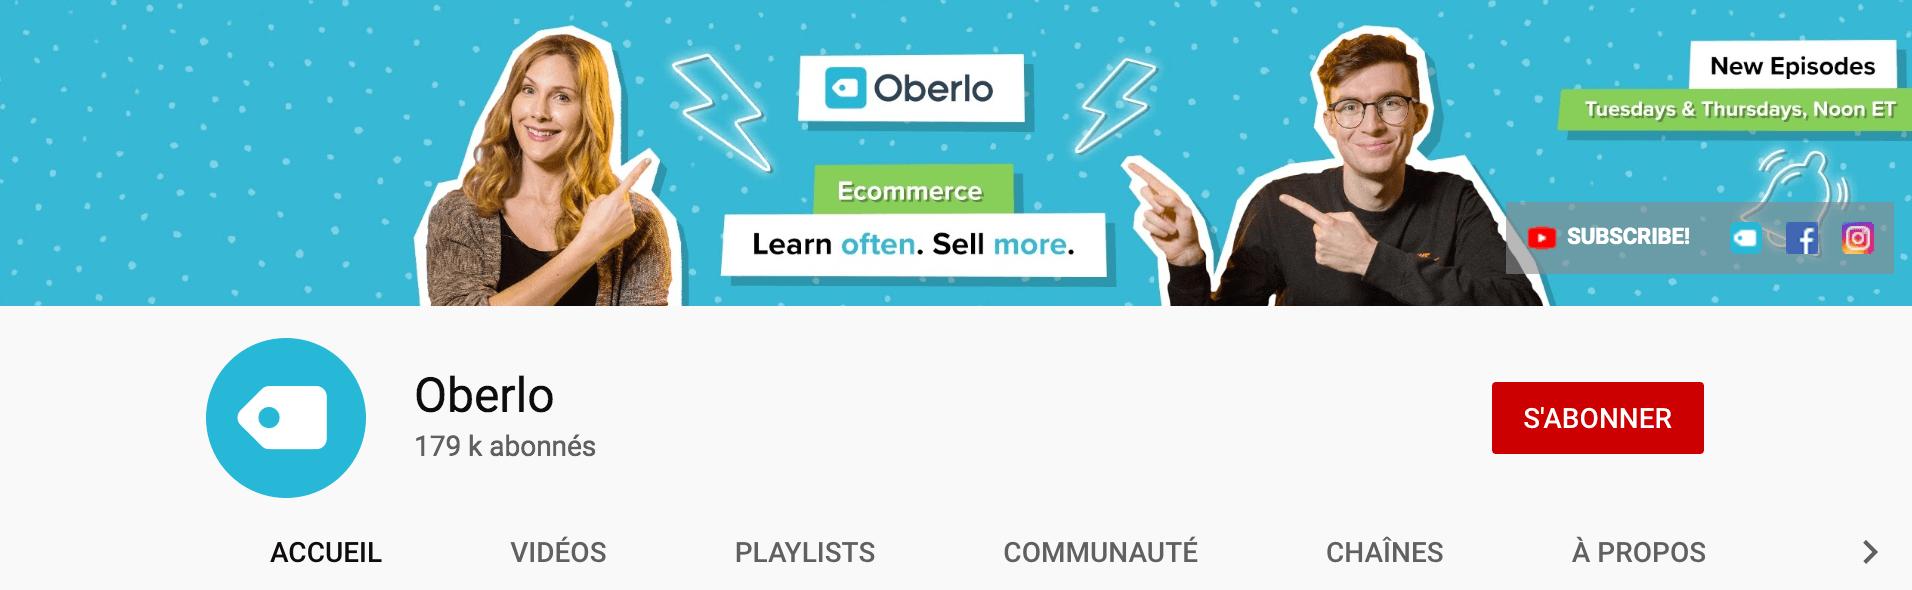 Oberlo chaîne YouTube